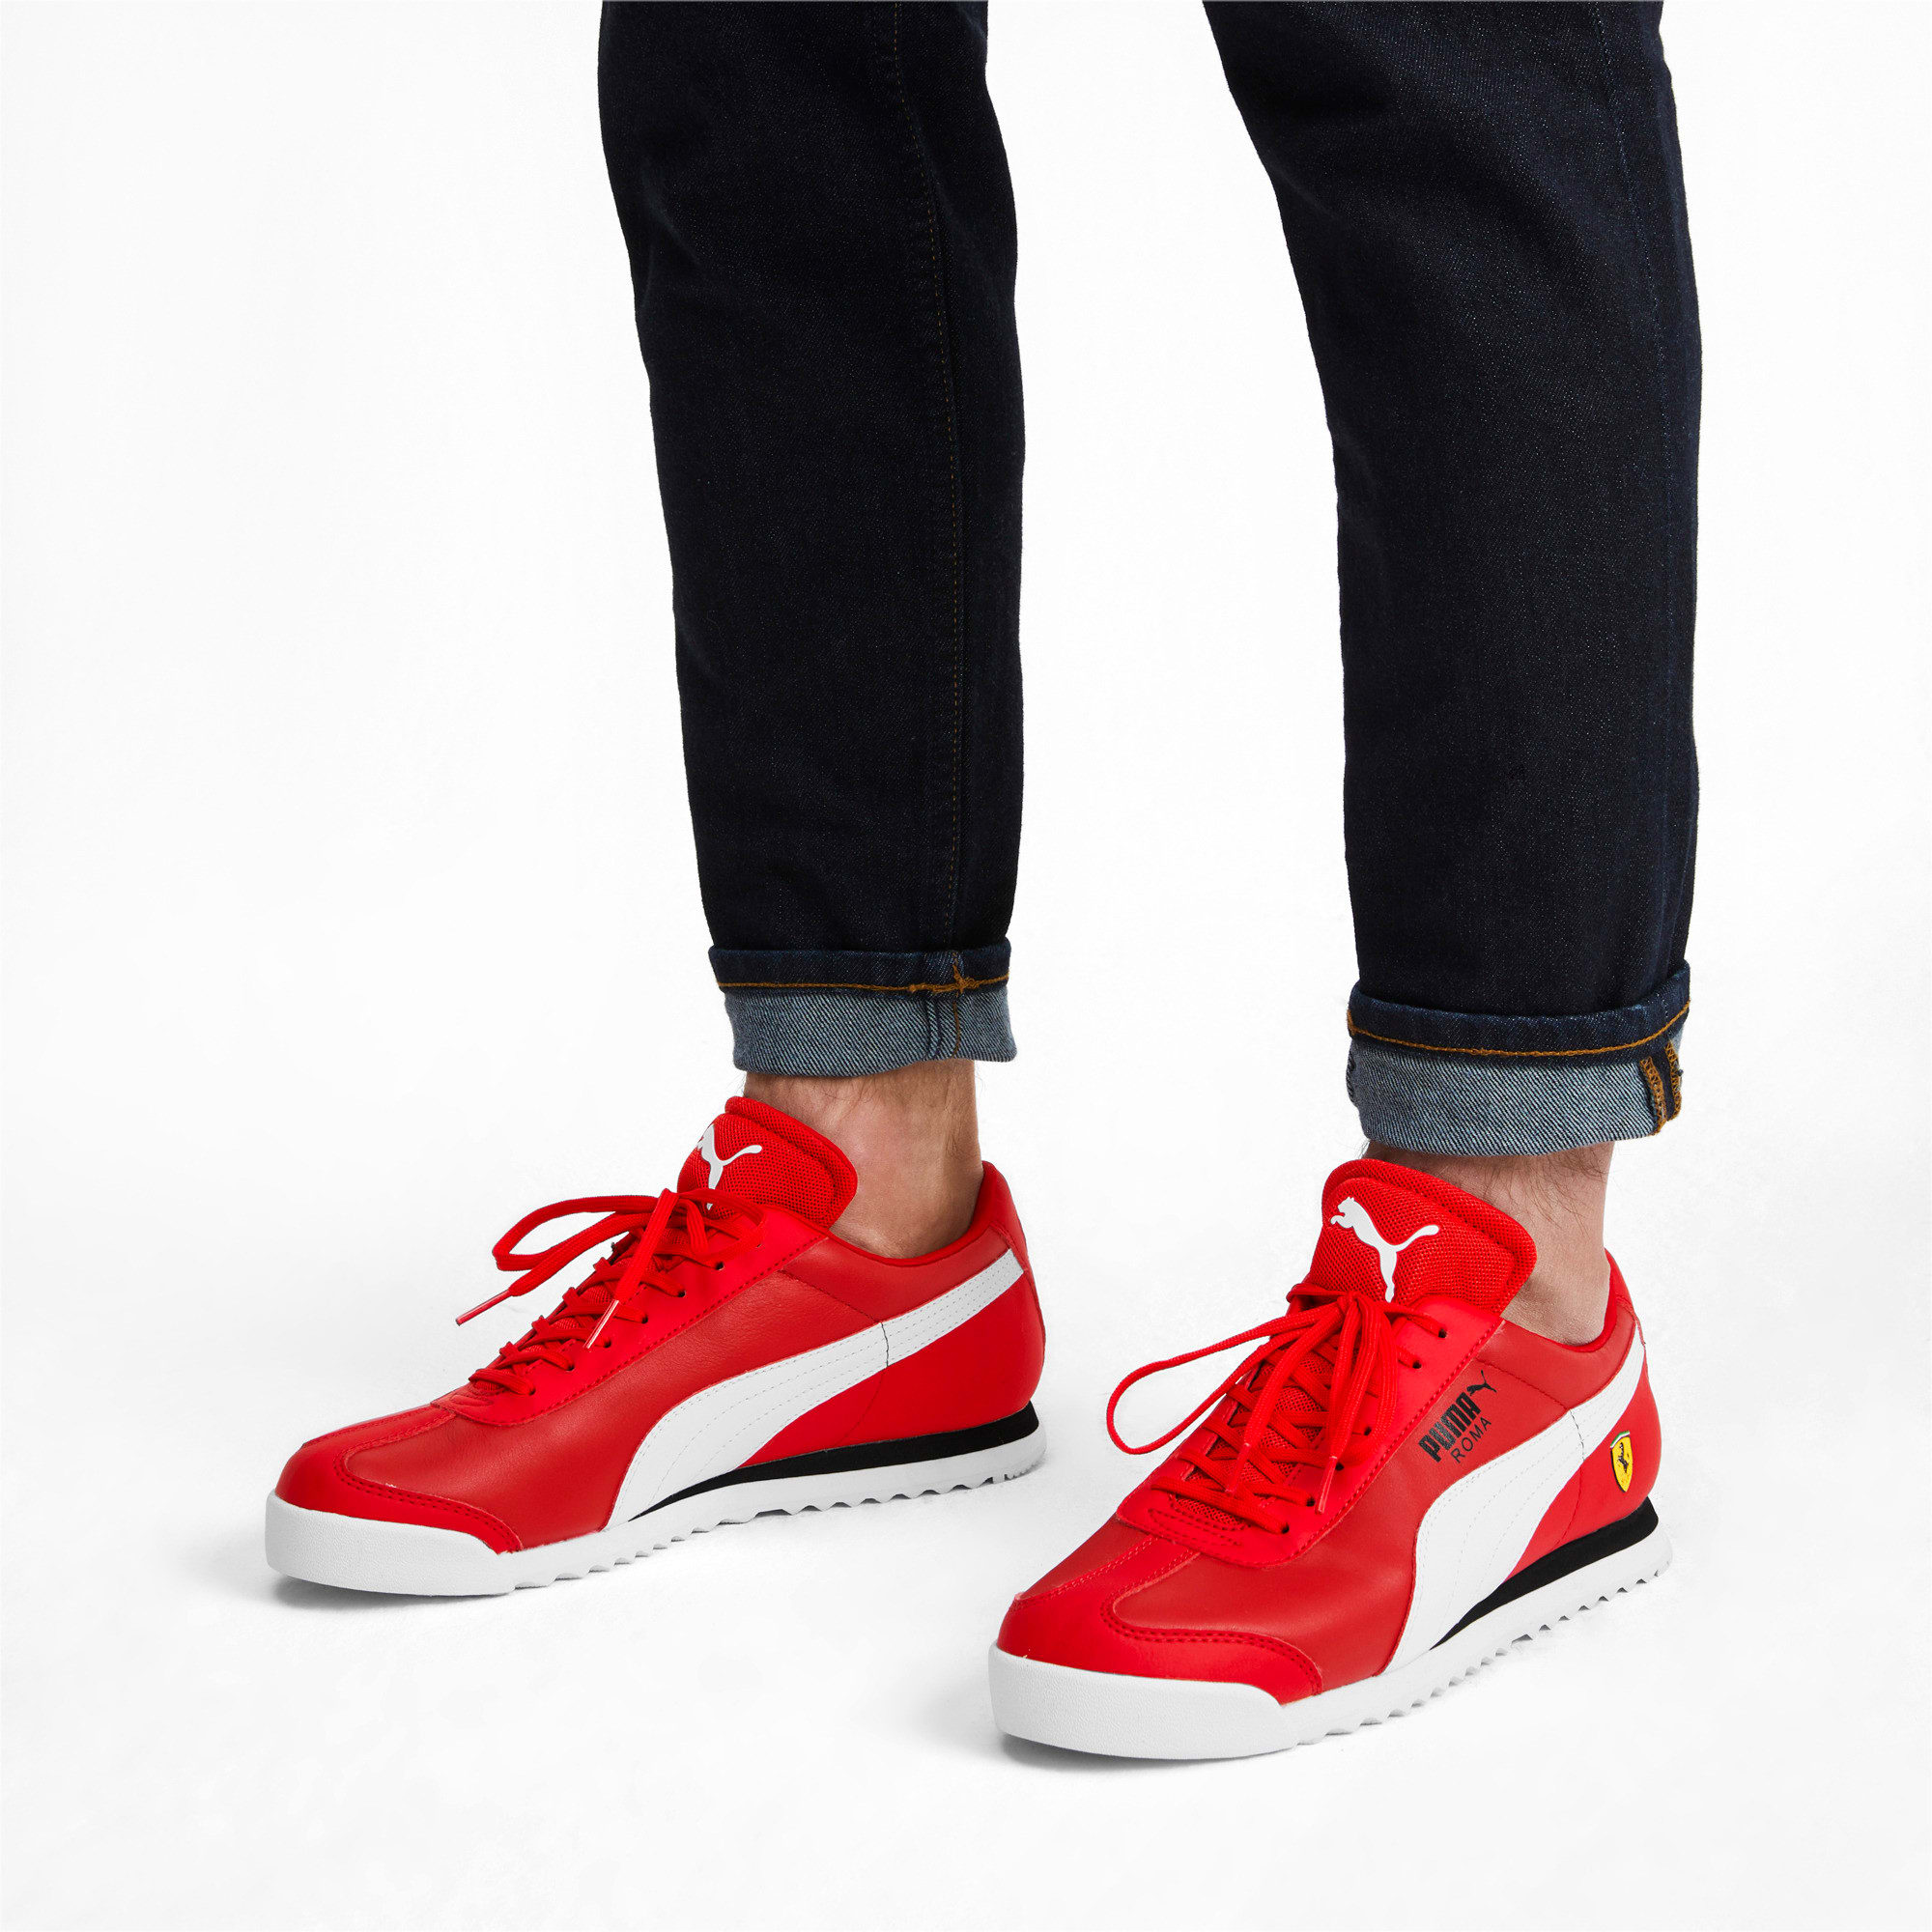 Miniatura 2 de Zapatos deportivos Scuderia Ferrari Roma para hombre, Rosso Corsa-White-Black, mediano